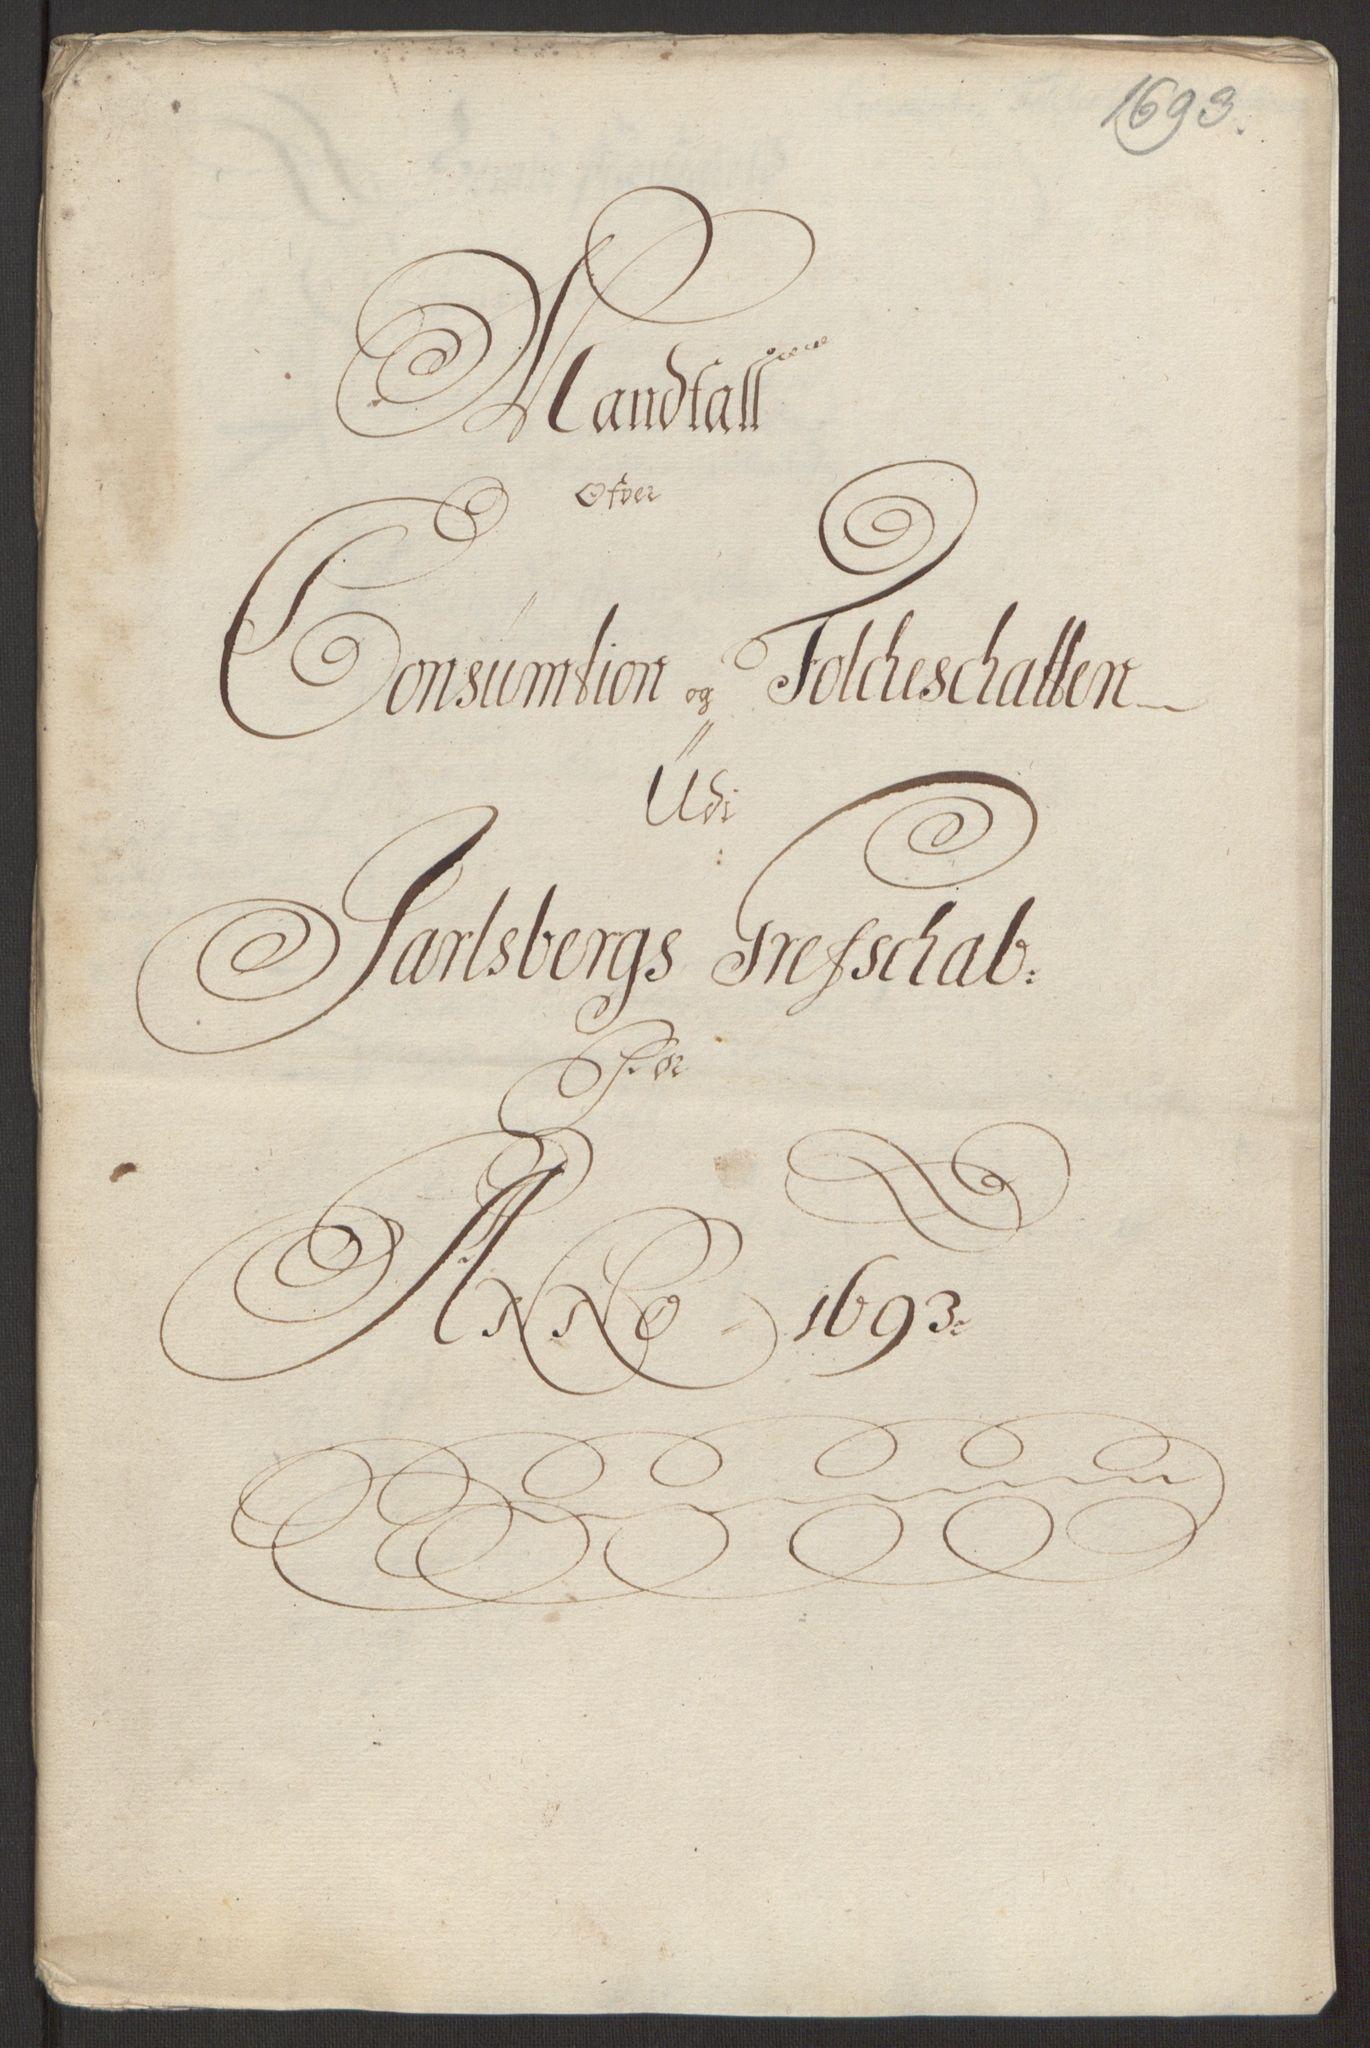 RA, Rentekammeret inntil 1814, Reviderte regnskaper, Fogderegnskap, R32/L1866: Fogderegnskap Jarlsberg grevskap, 1693, s. 219